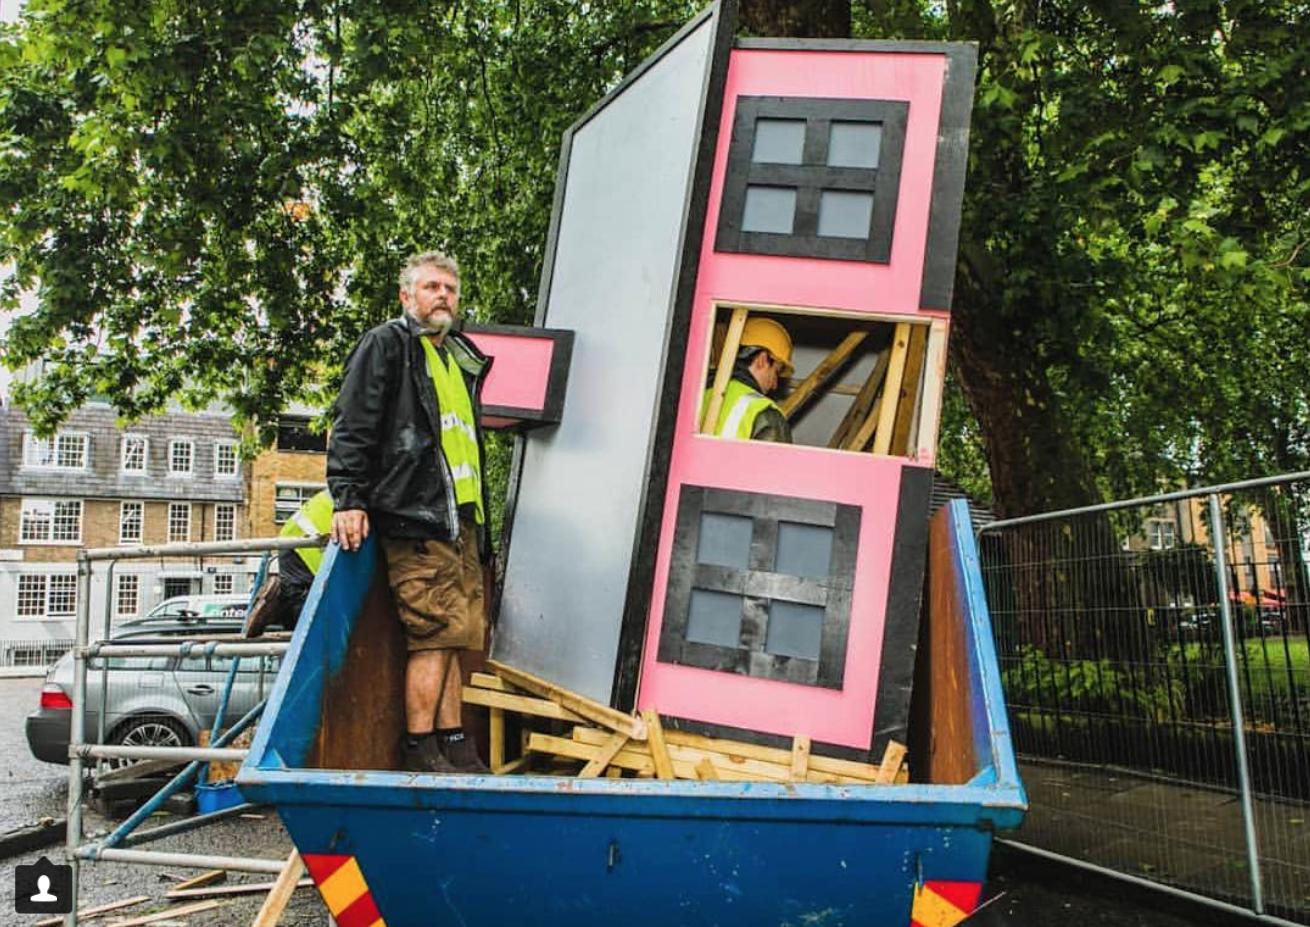 Richard installing 'Upgrade'